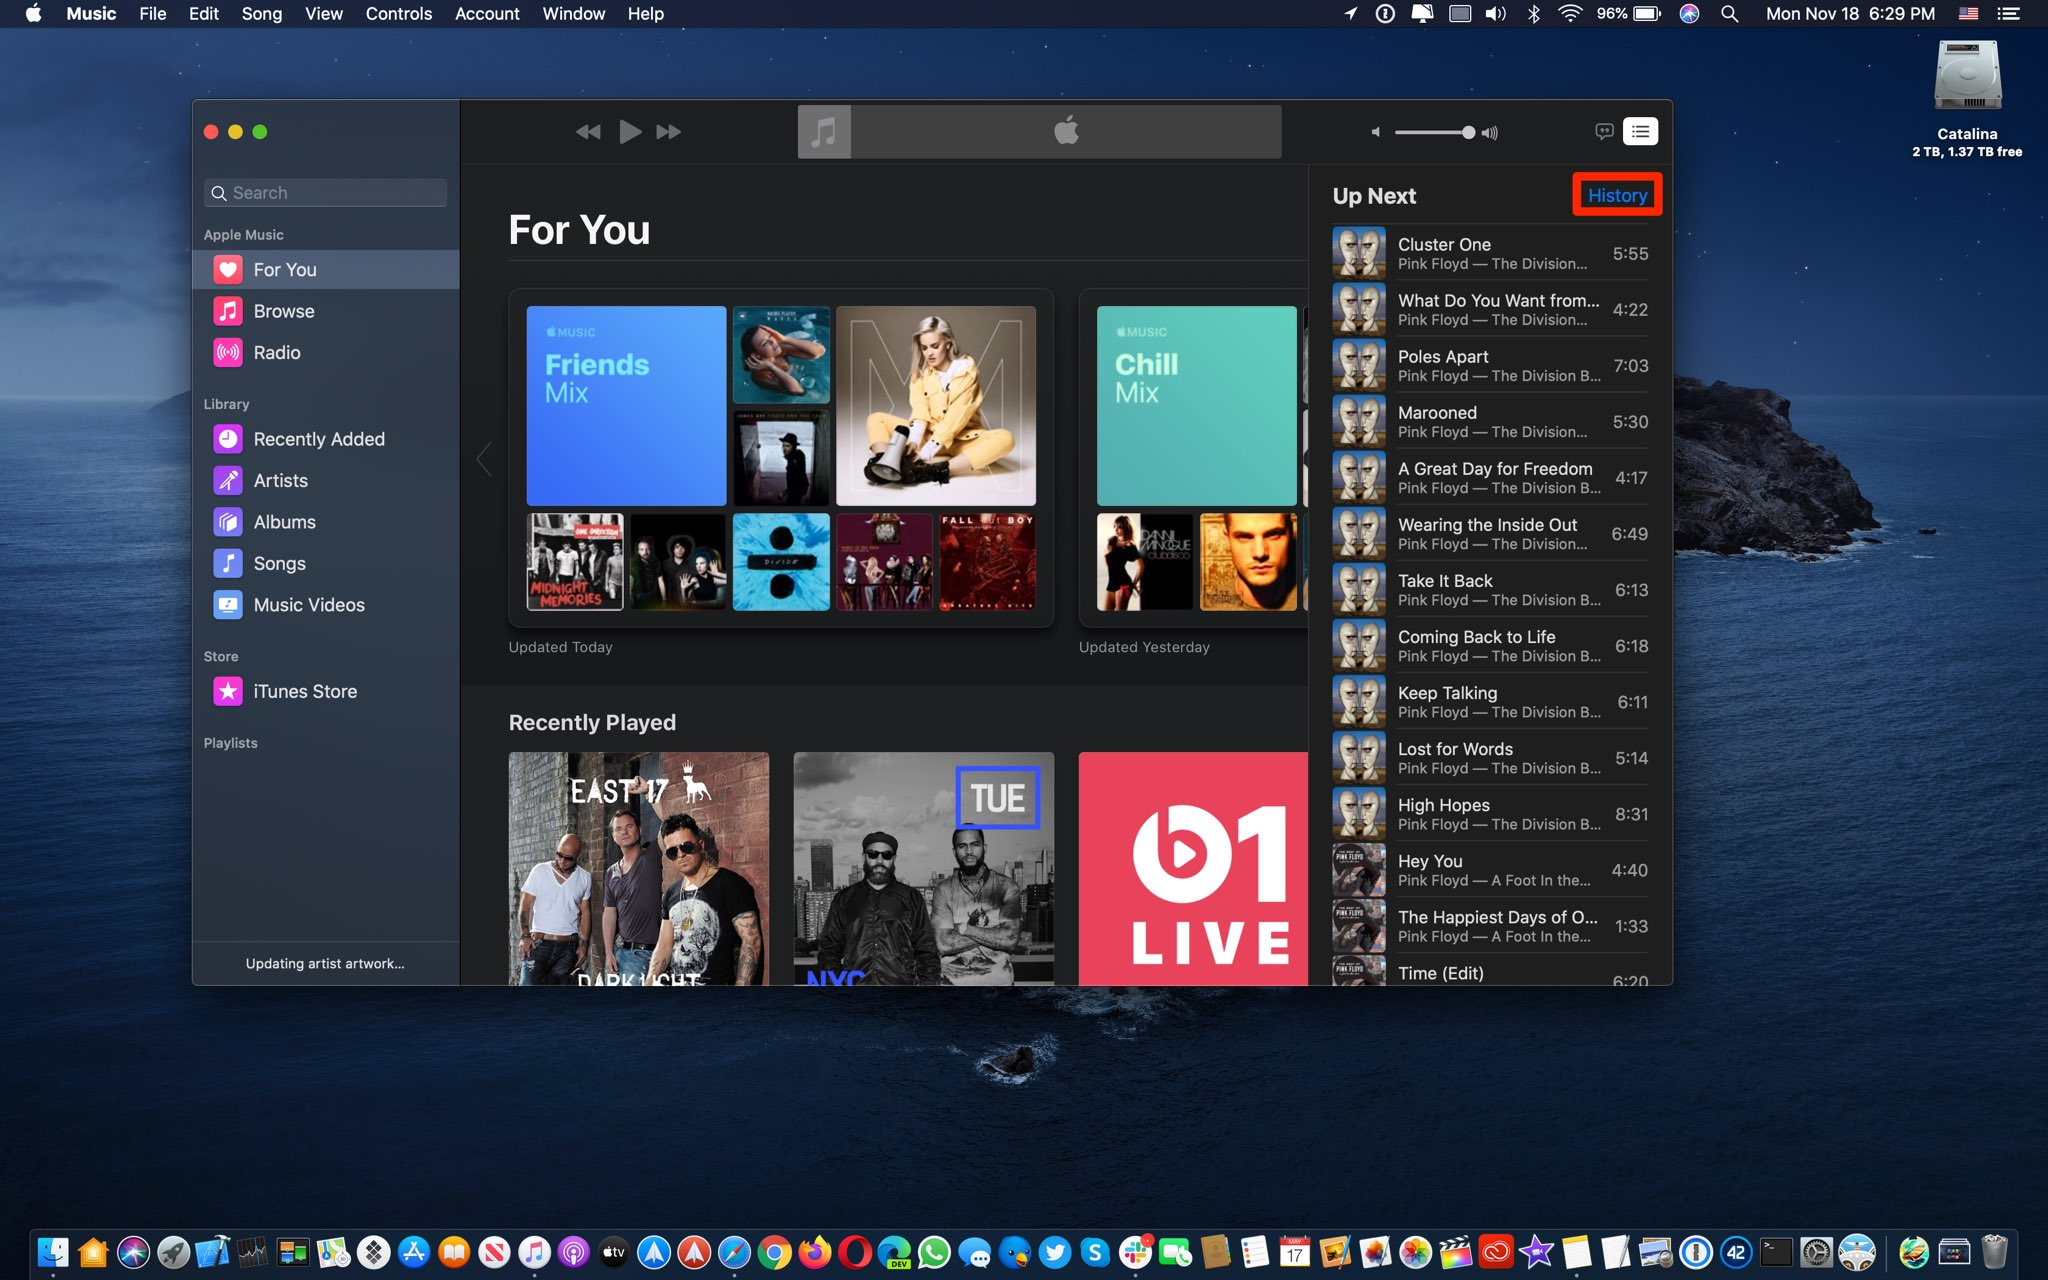 Apple Music listening history